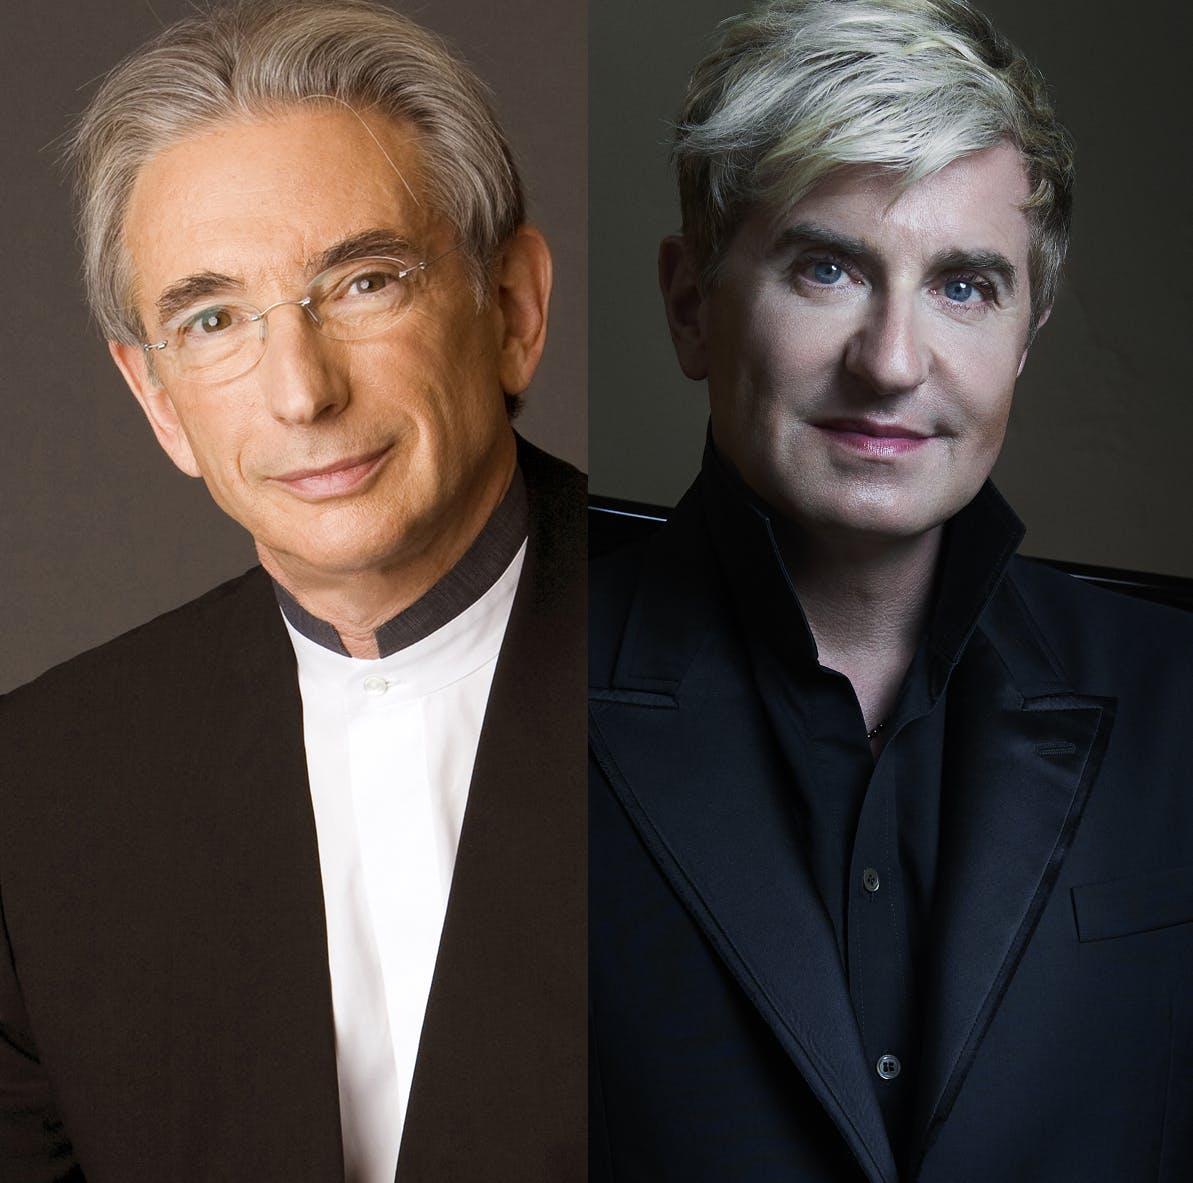 Michael Tilson Thomas and Jean-Yves Thibaudet